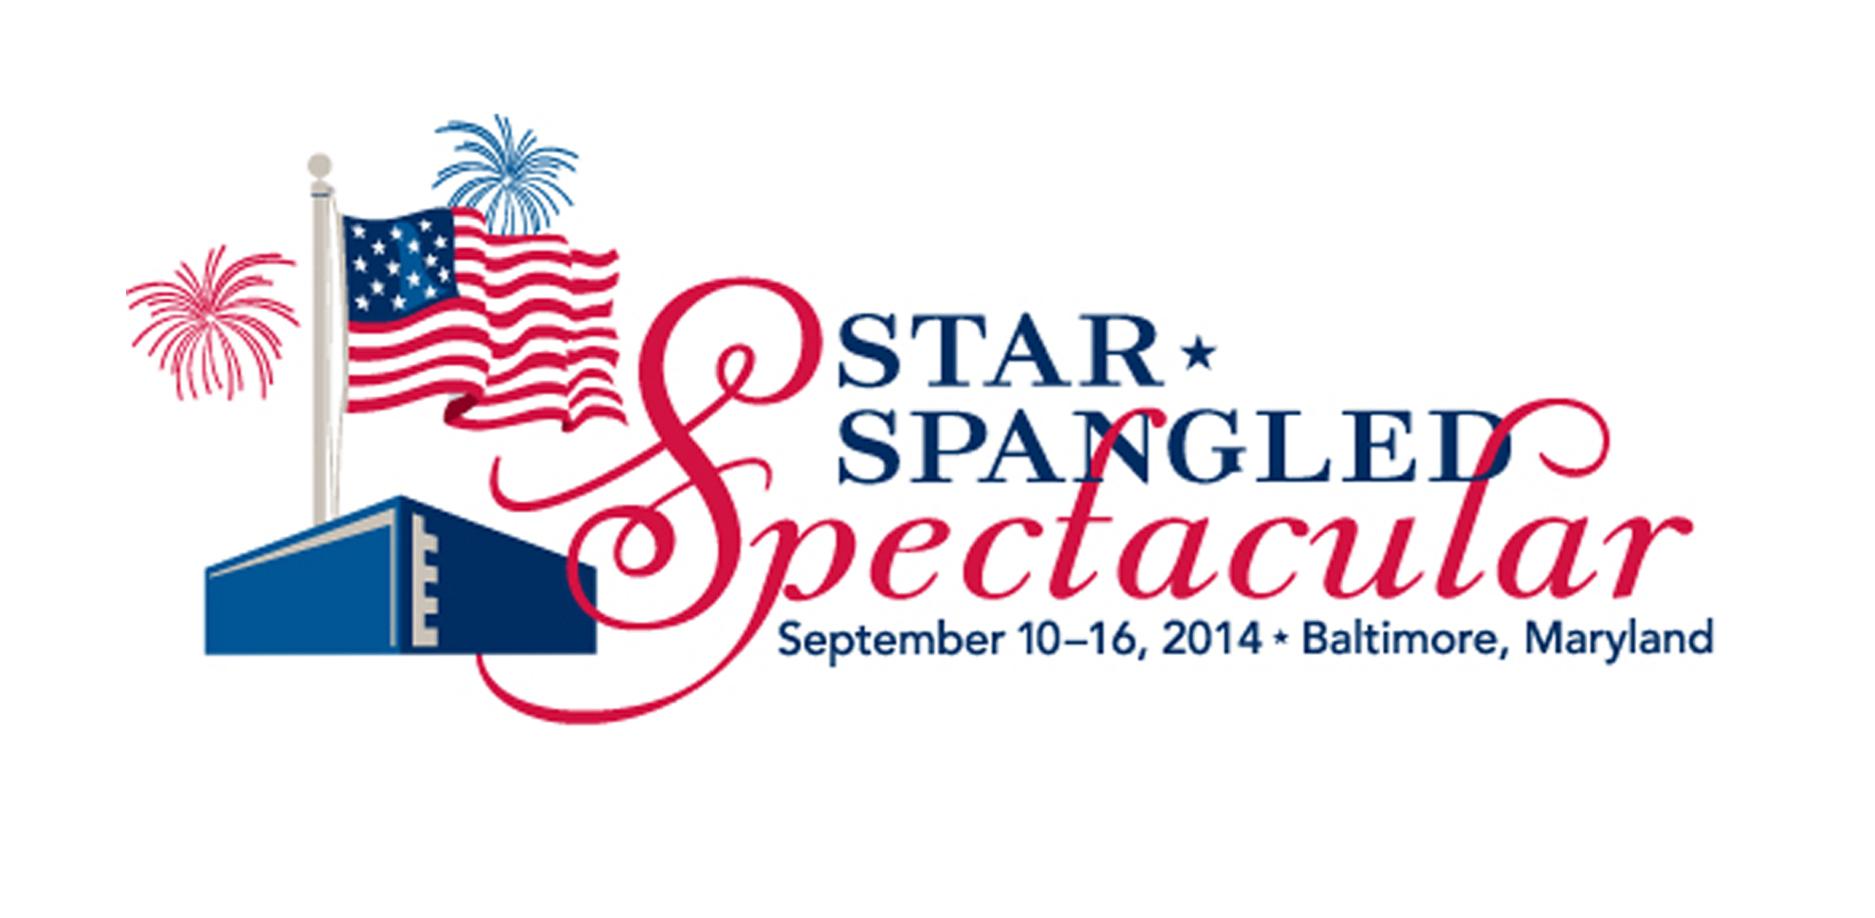 Star*Spangled Spectacular